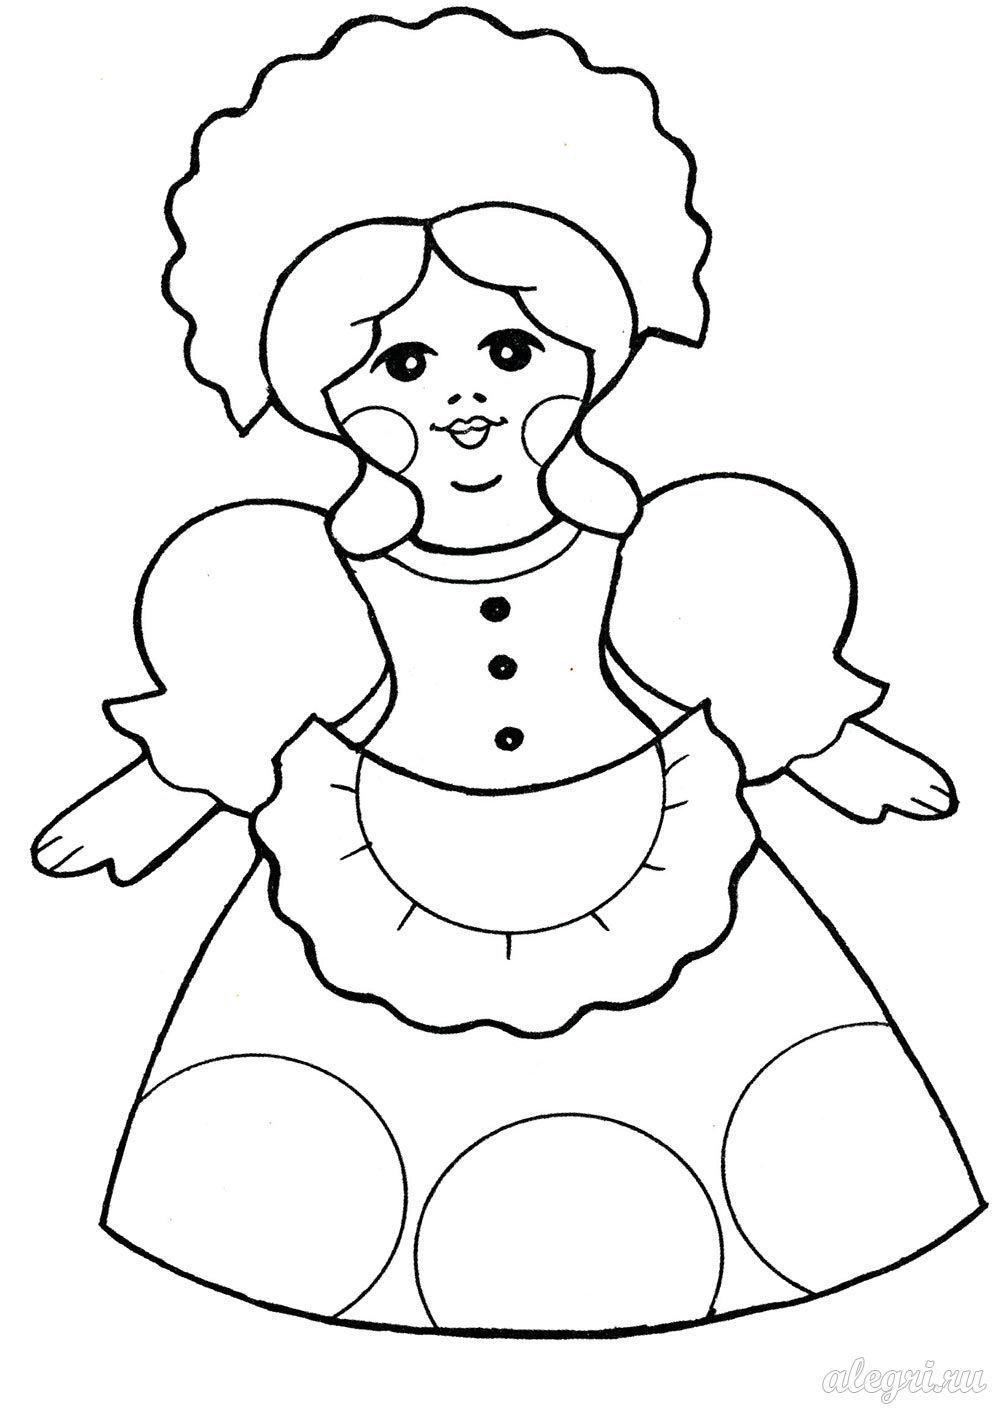 Раскраска для девочек. Глиняная кукла